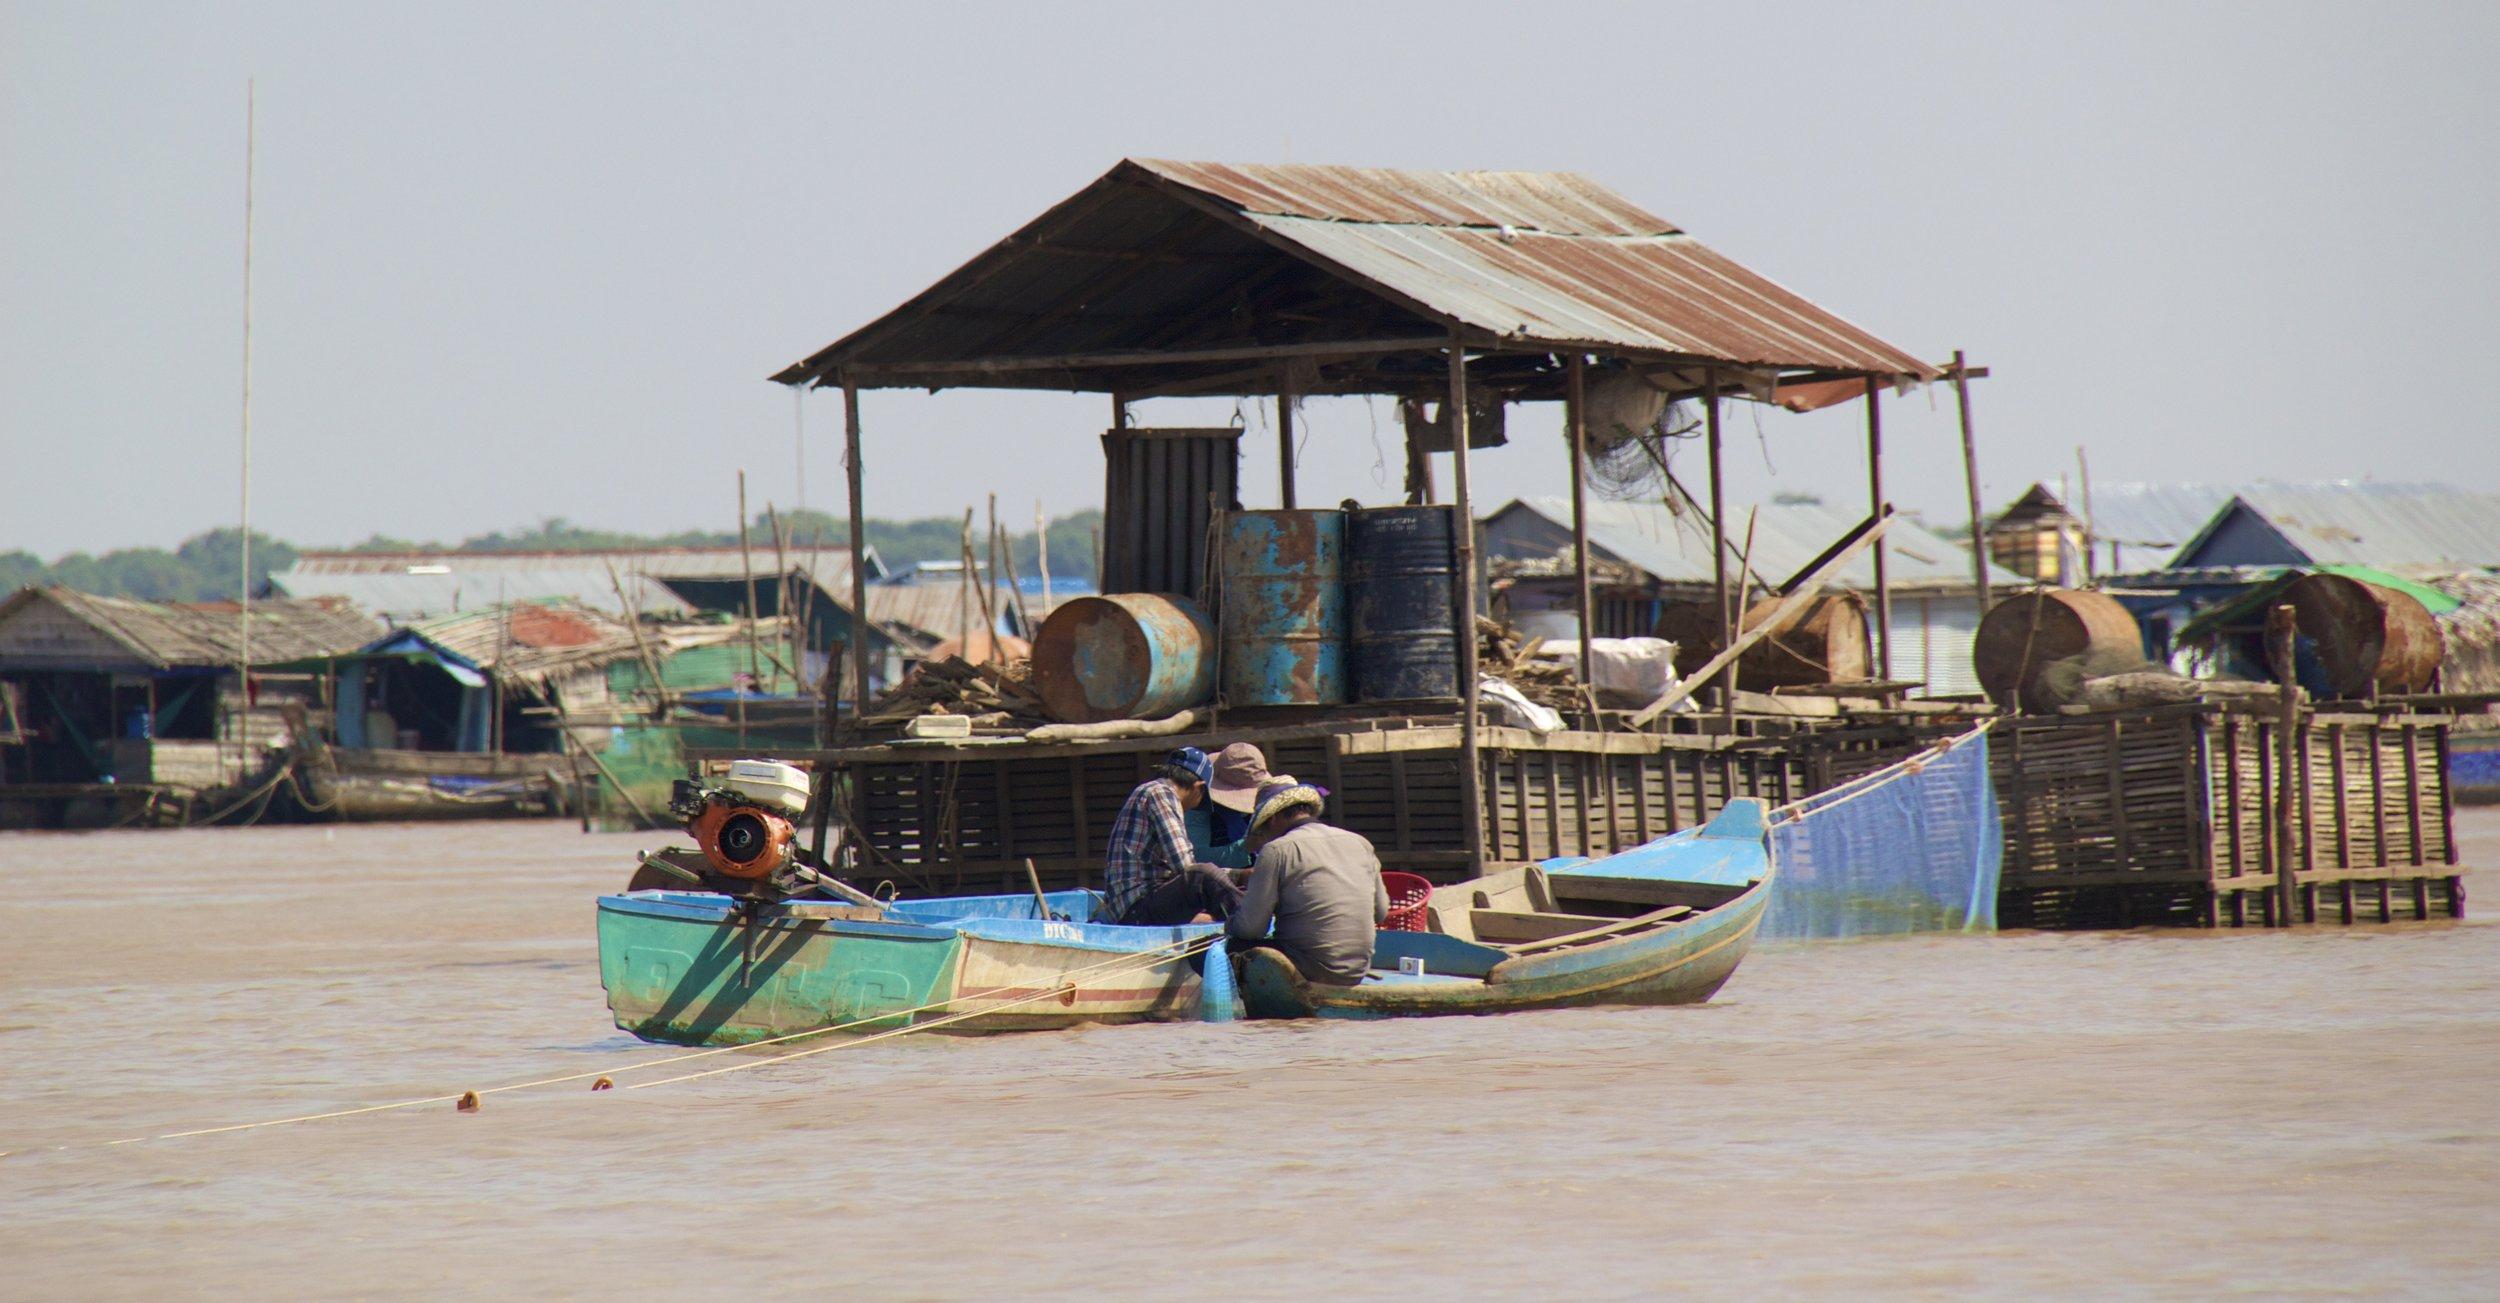 tonle sap siem reap cambodia floating villages 12.jpg